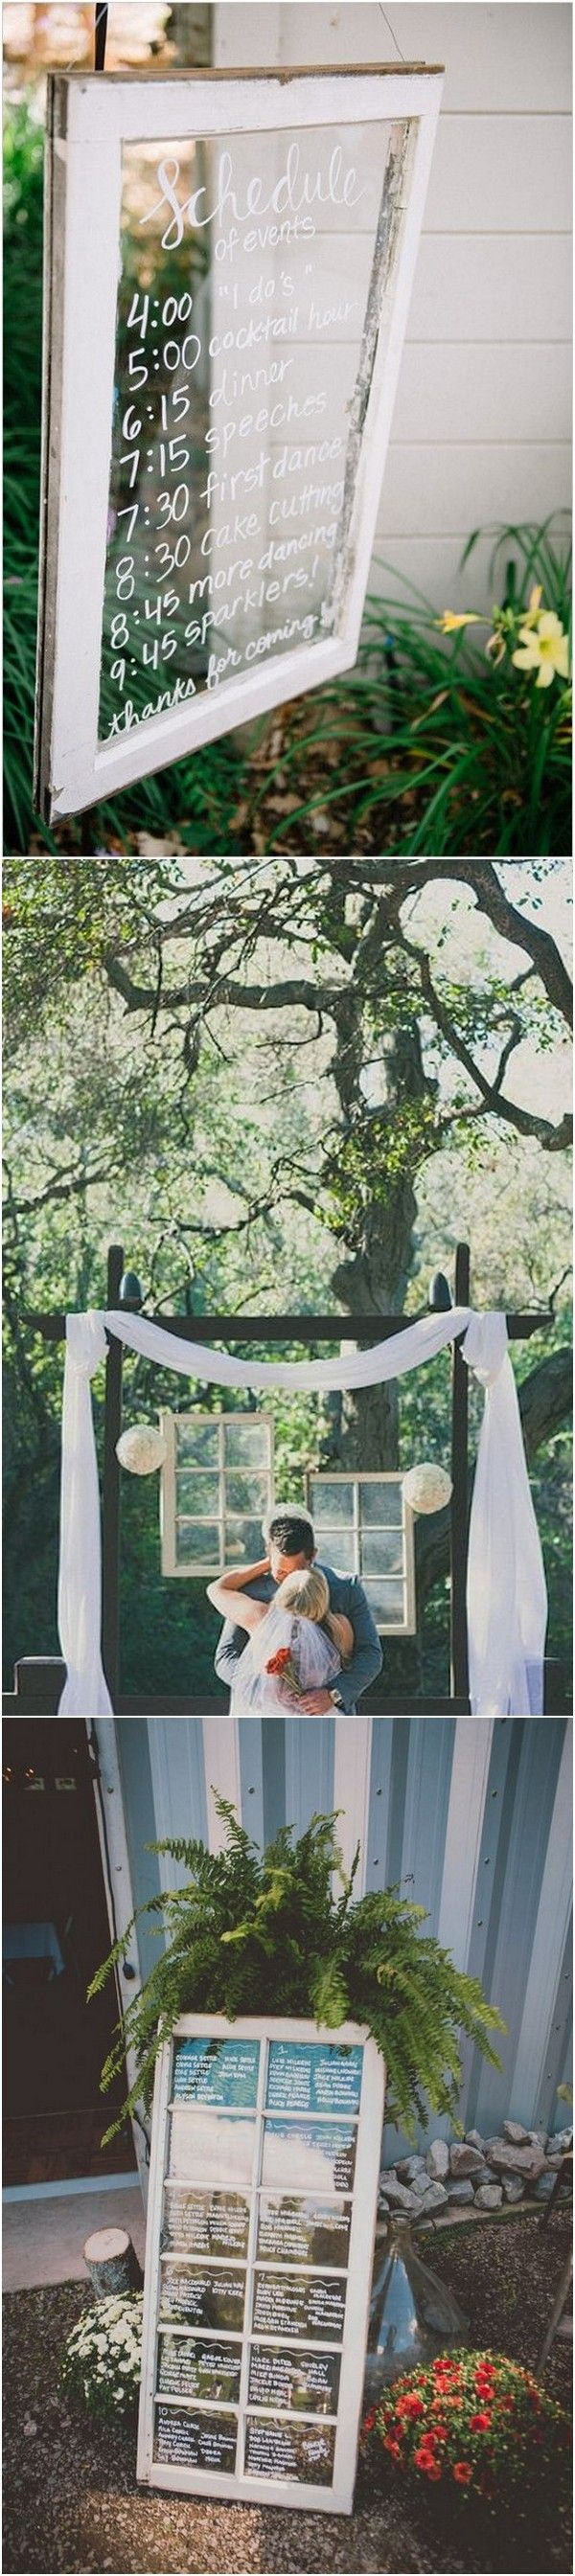 Diy vintage wedding decoration ideas   DIY Wedding Decoration Ideas with Vintage Windows  Page  of